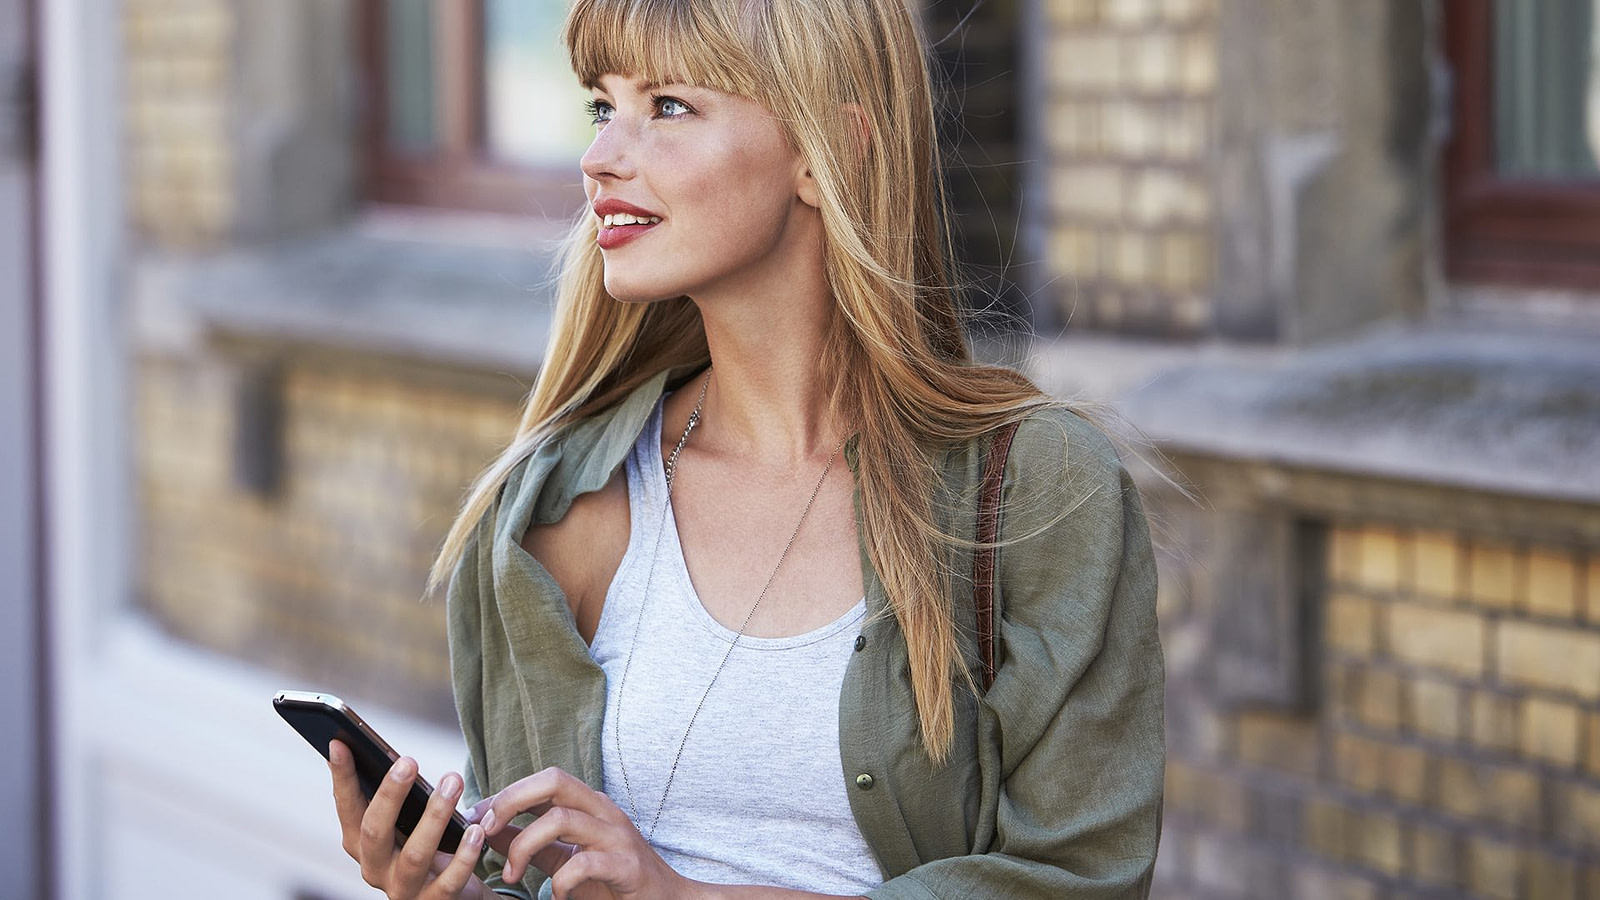 helize-marketing-online-social-media-redes-sociales-agencia